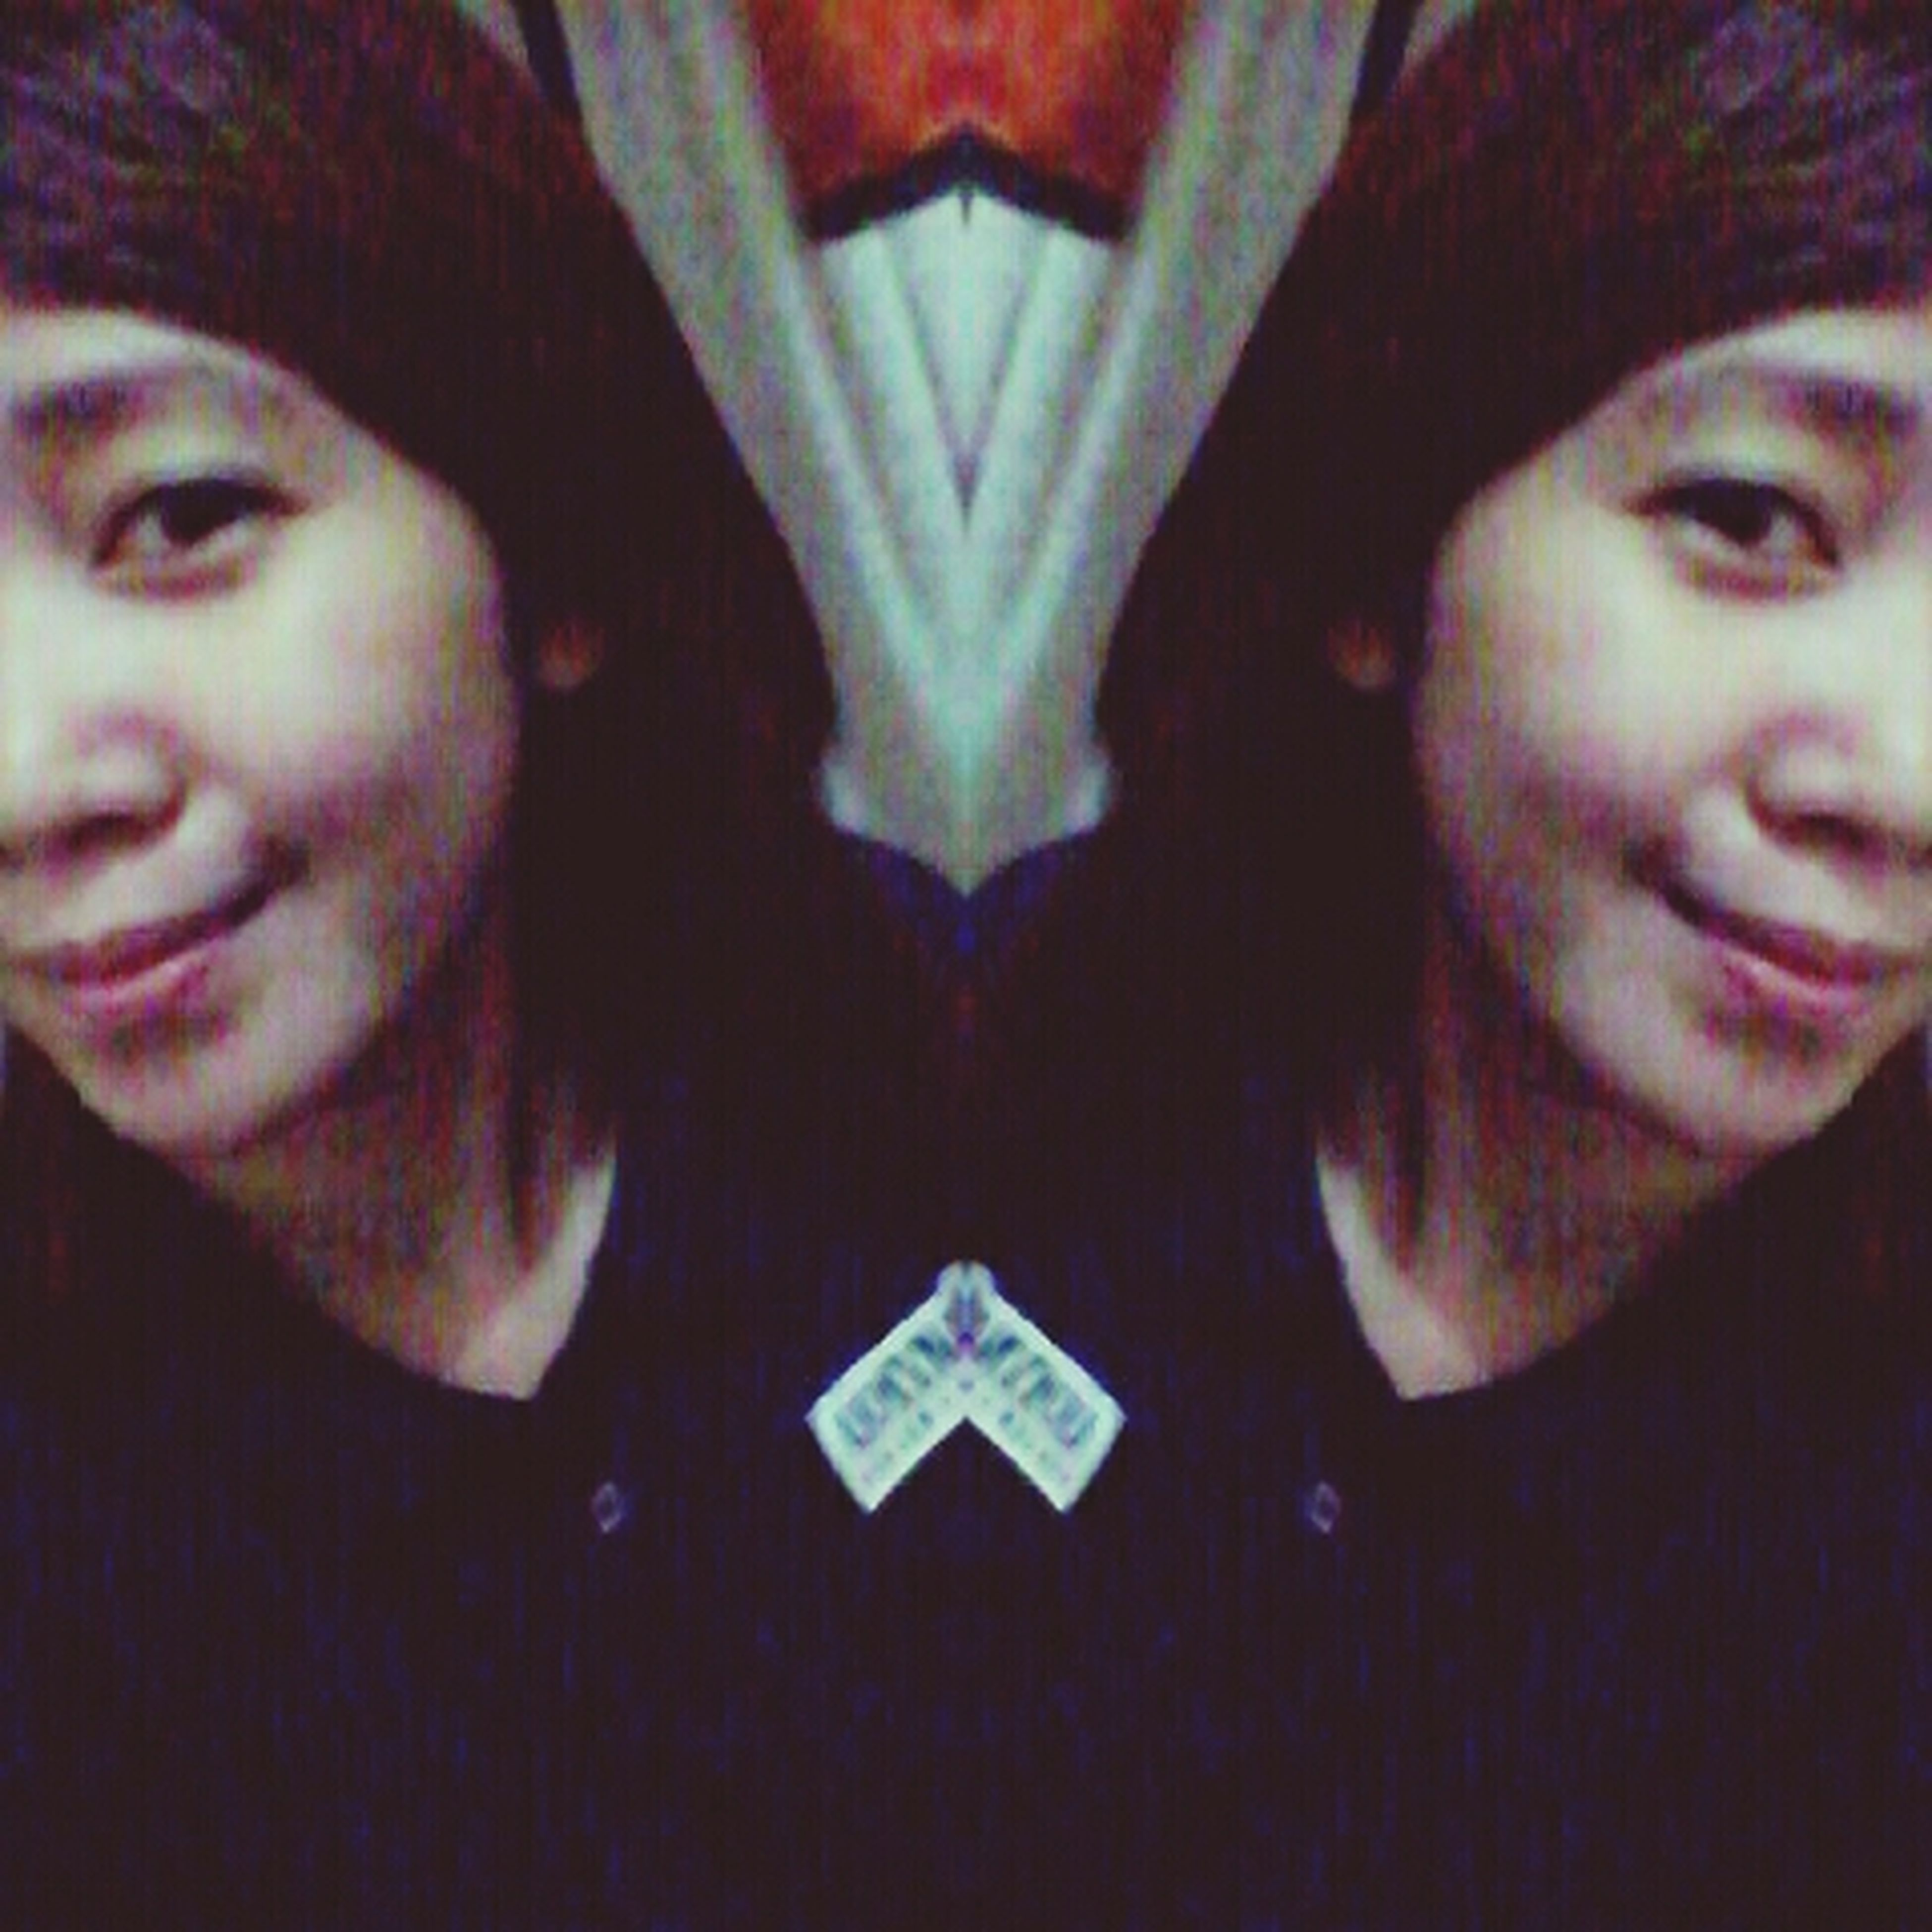 First eyeem selfie photo. Hihi